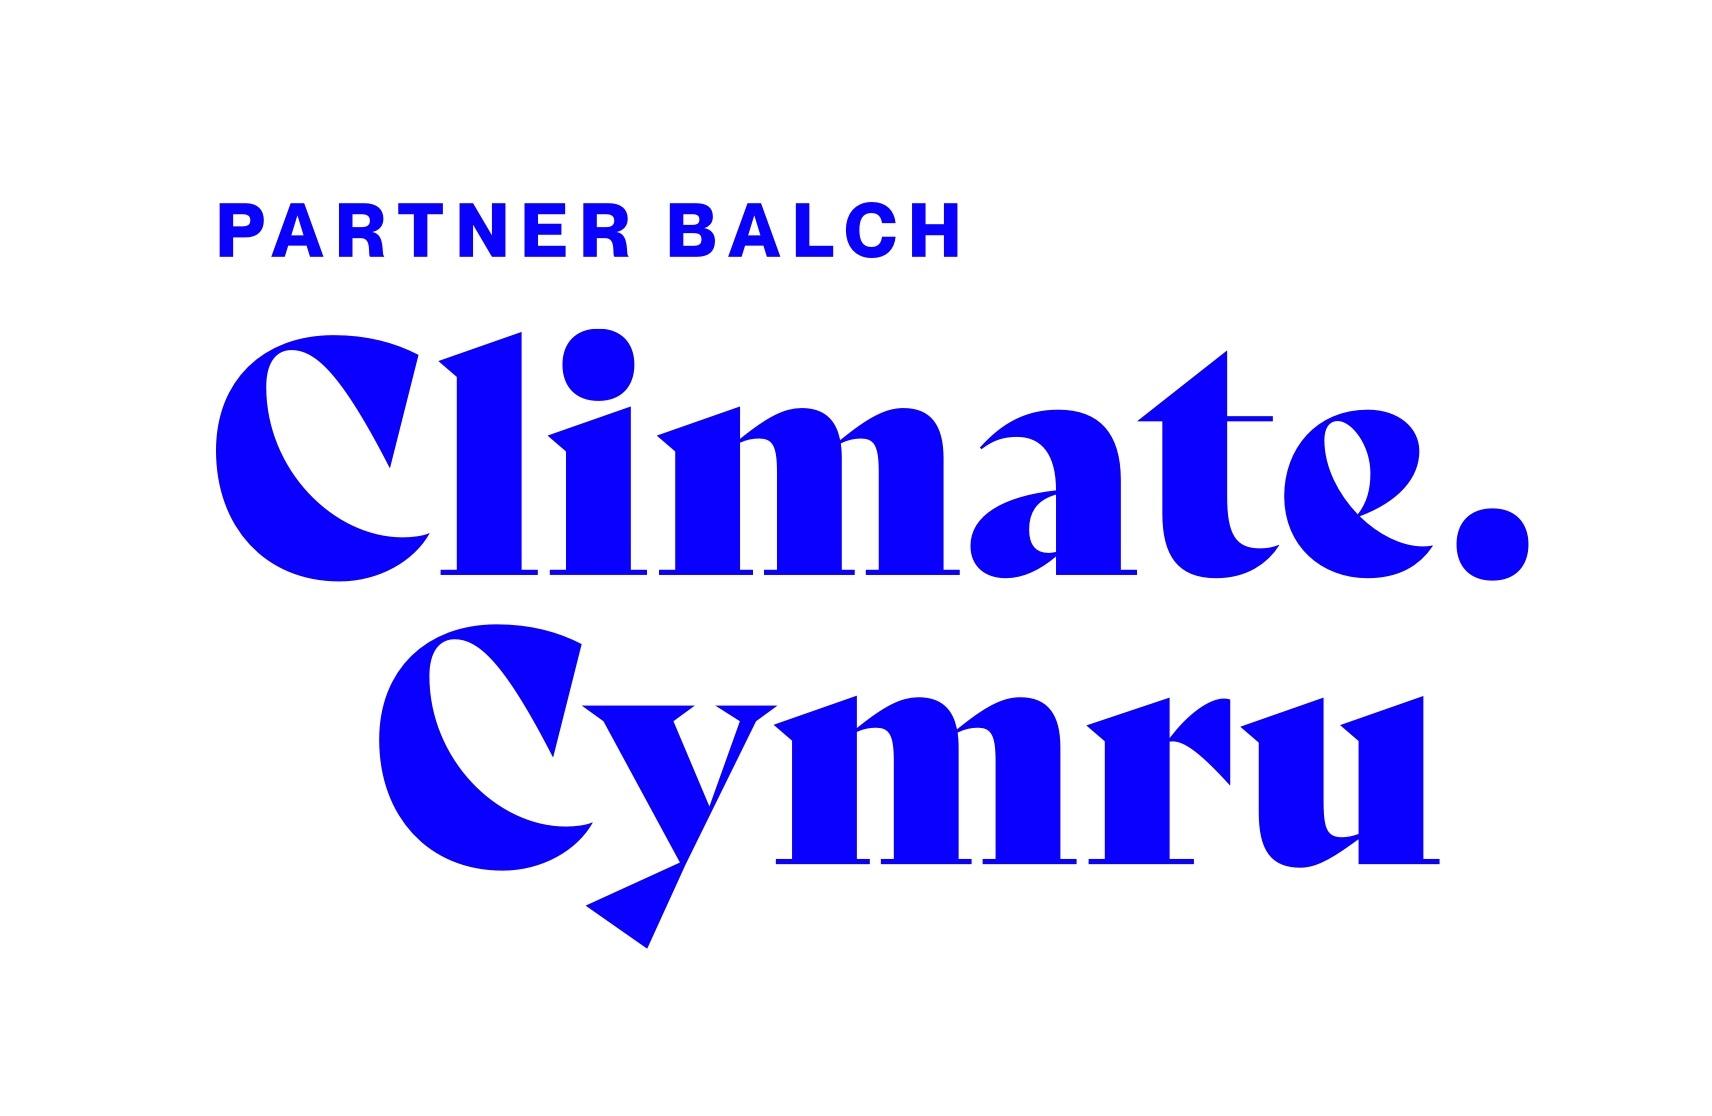 Climate Cymru Welsh